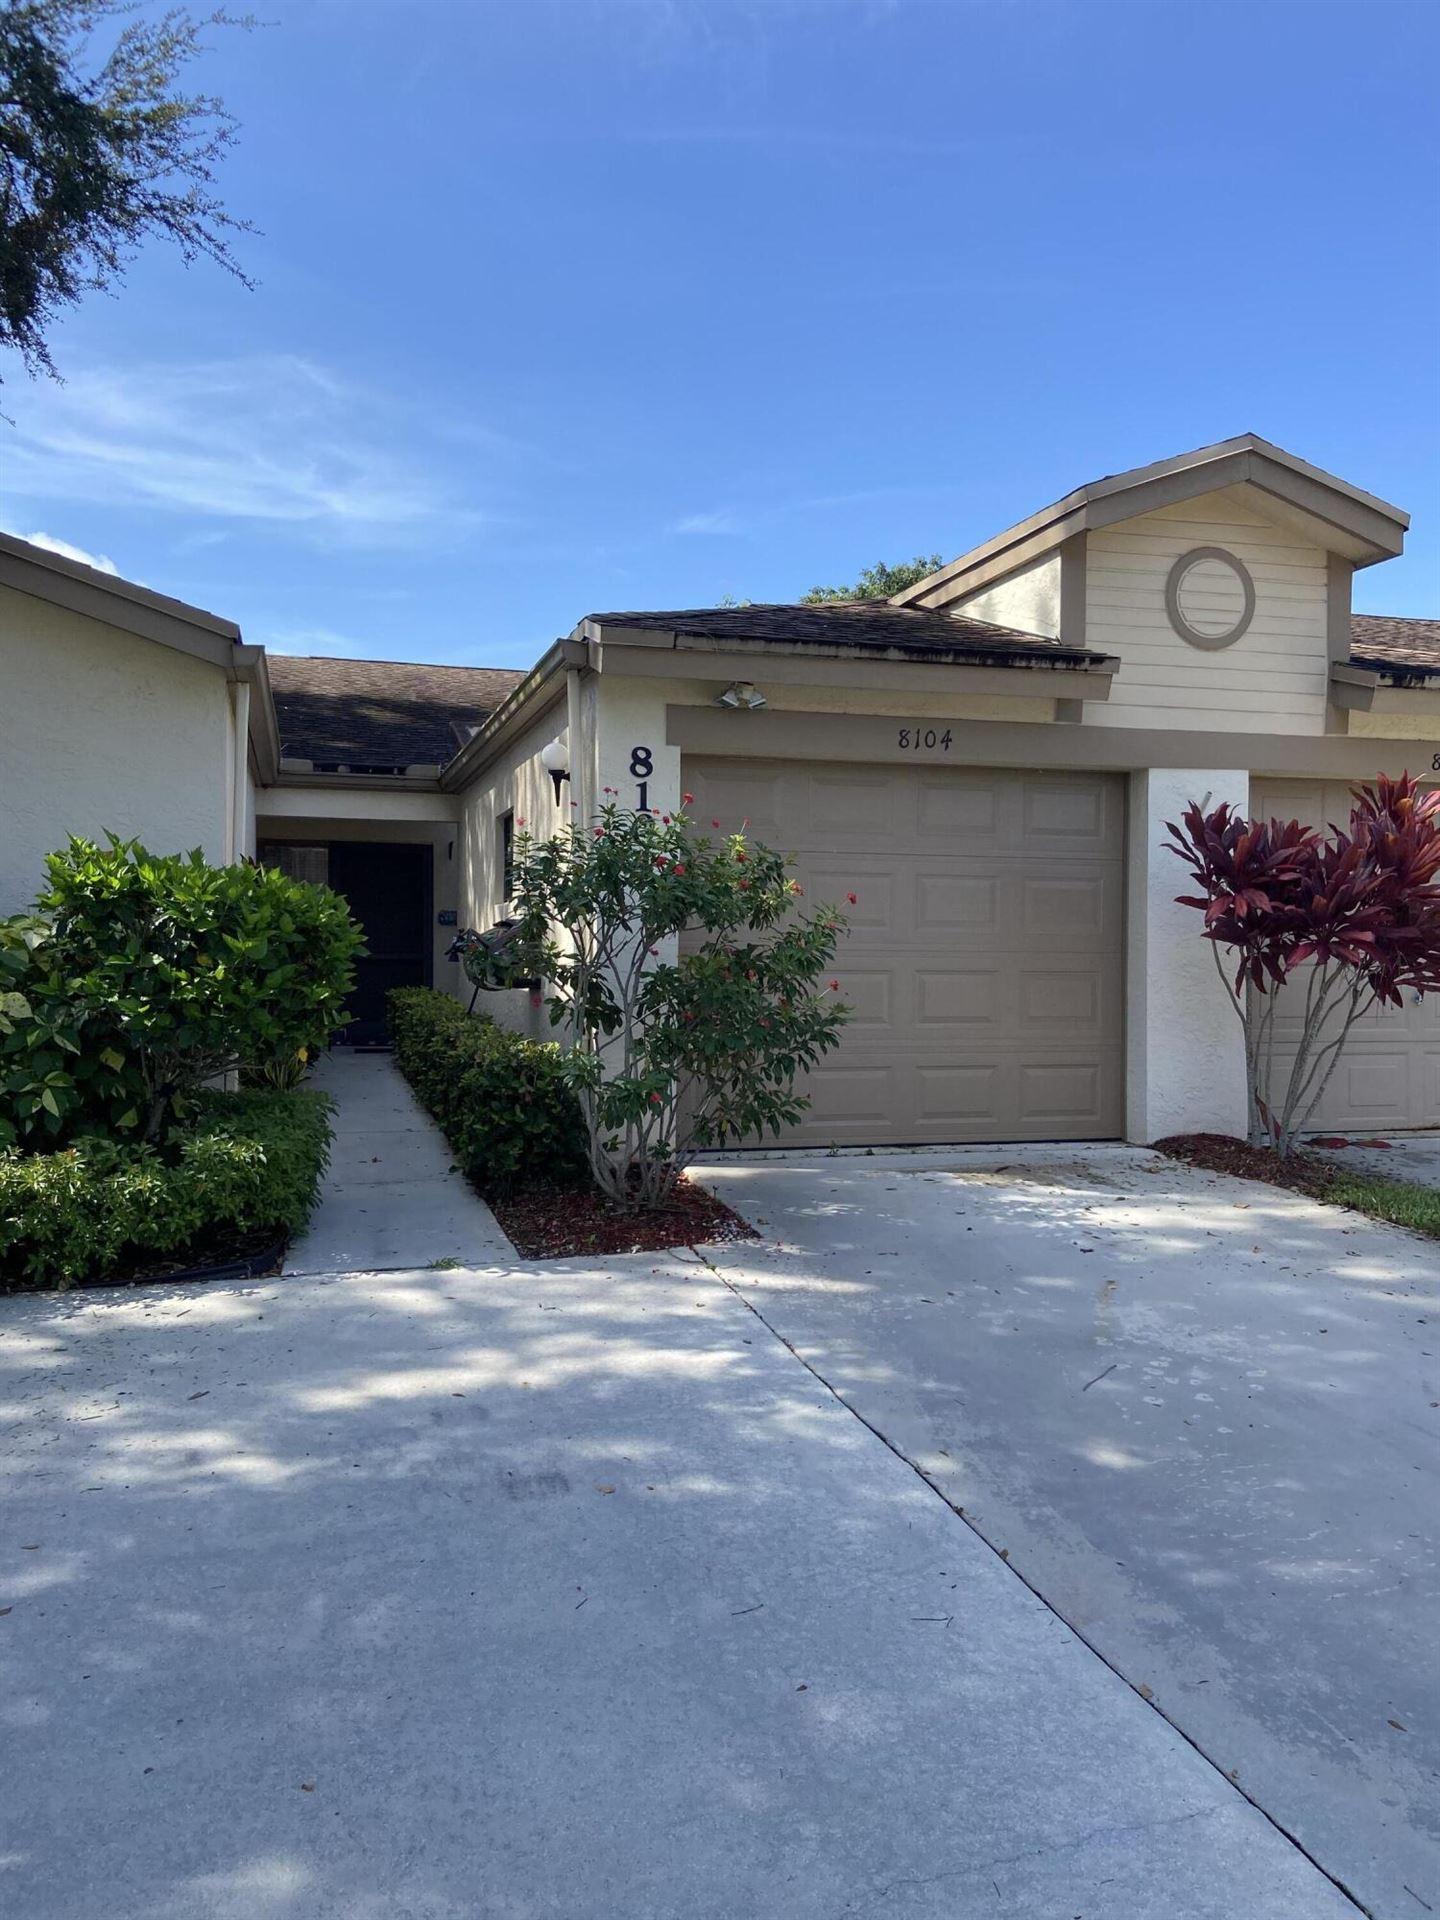 8104 Windgate Drive, Boca Raton, FL 33496 - MLS#: RX-10742330